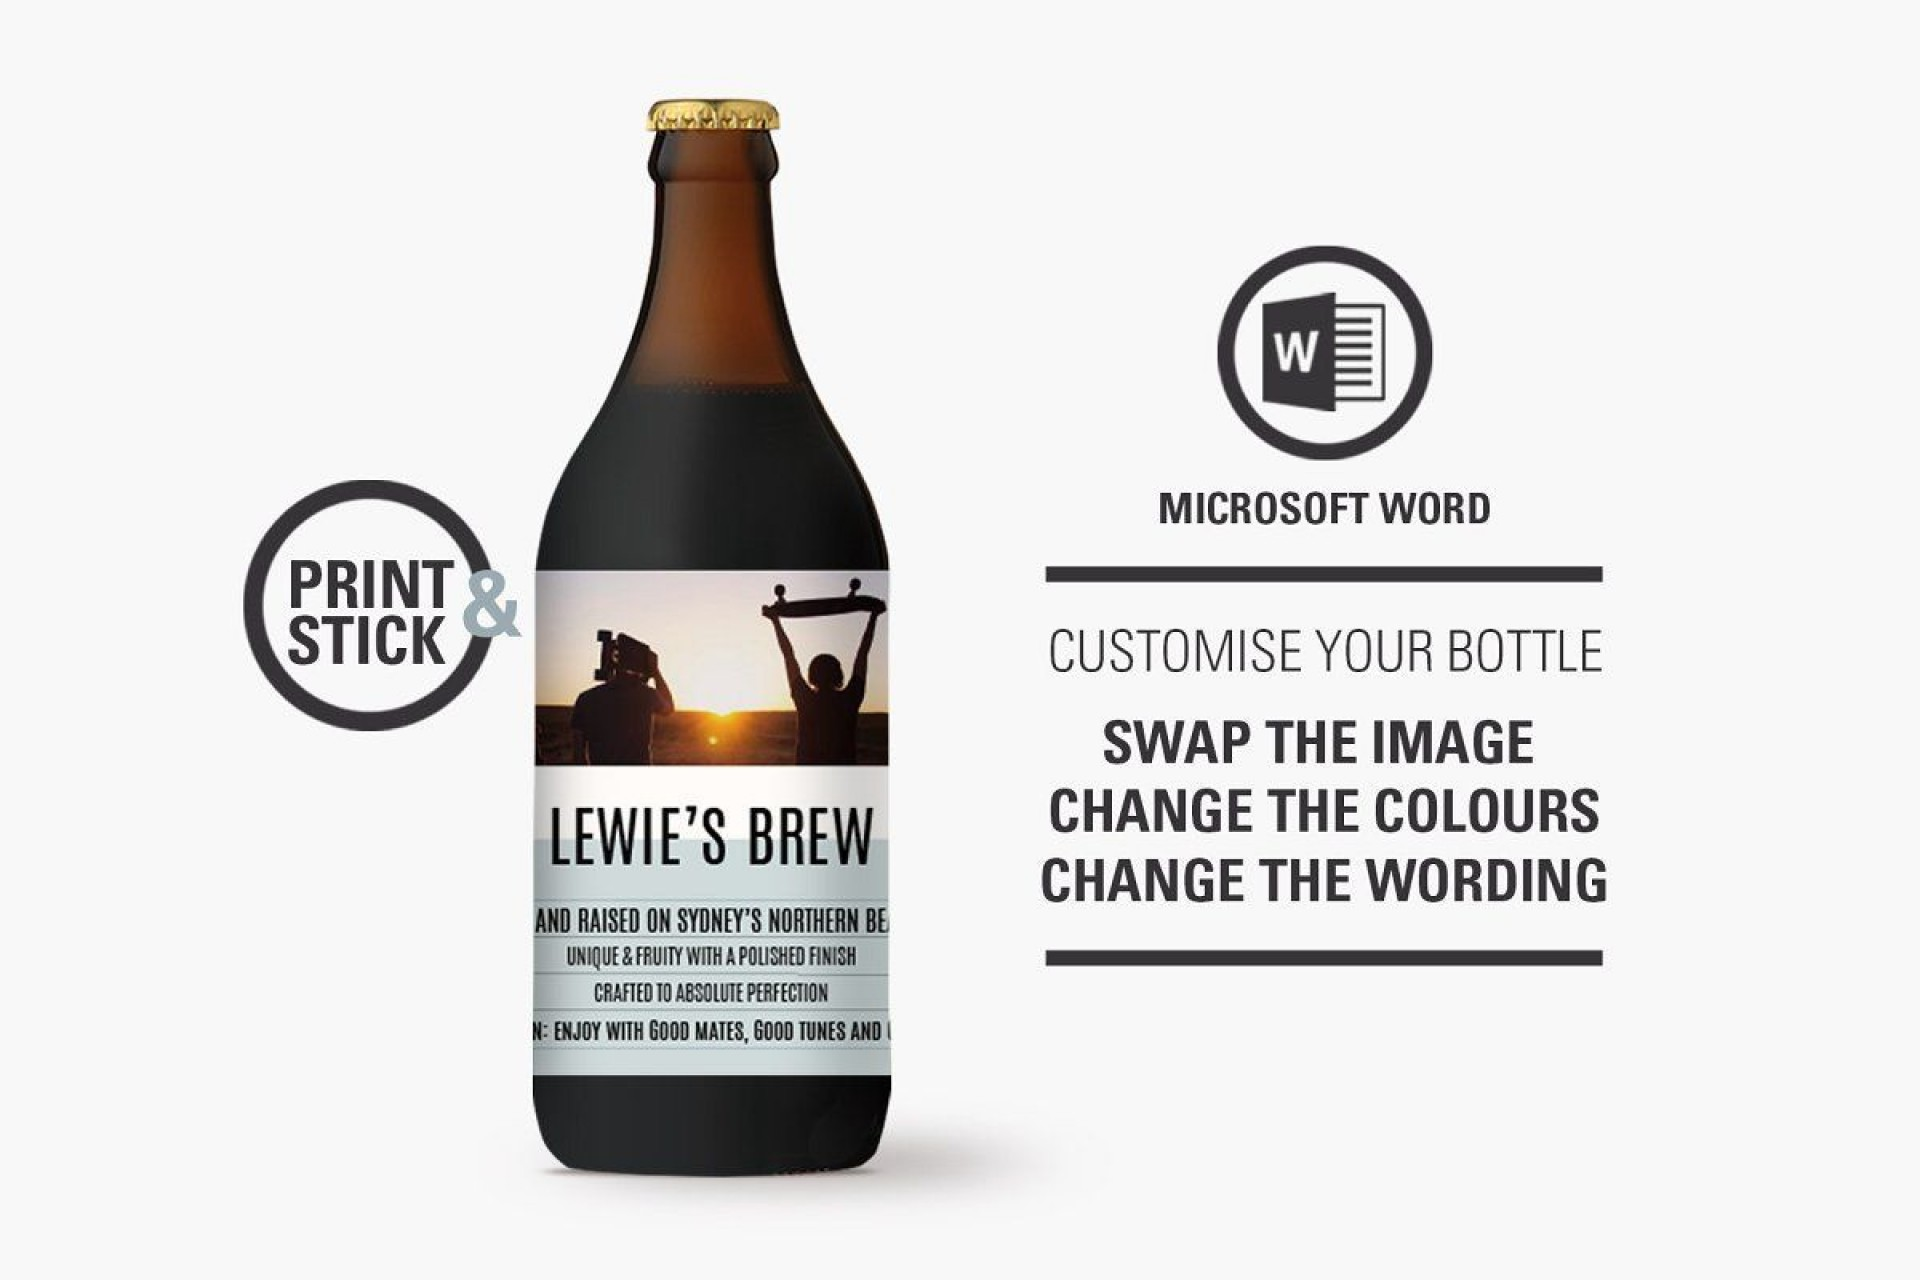 006 Best Beer Bottle Label Template Word Image  Free1920